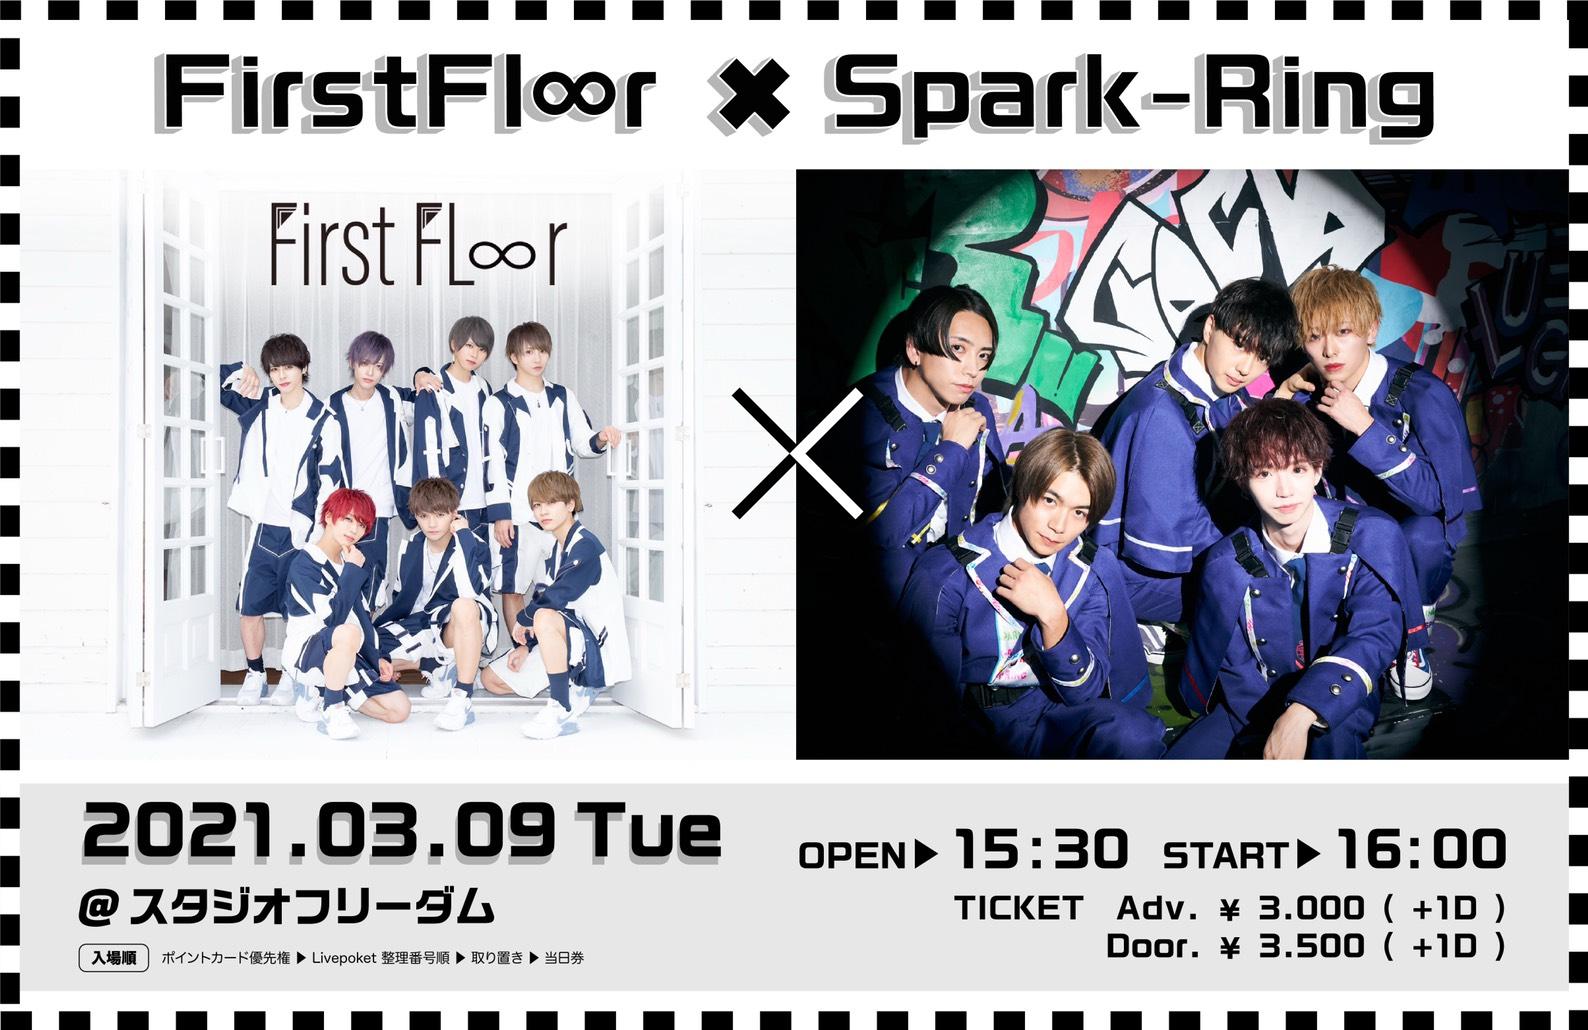 FirstFl∞r×Spark-Ring